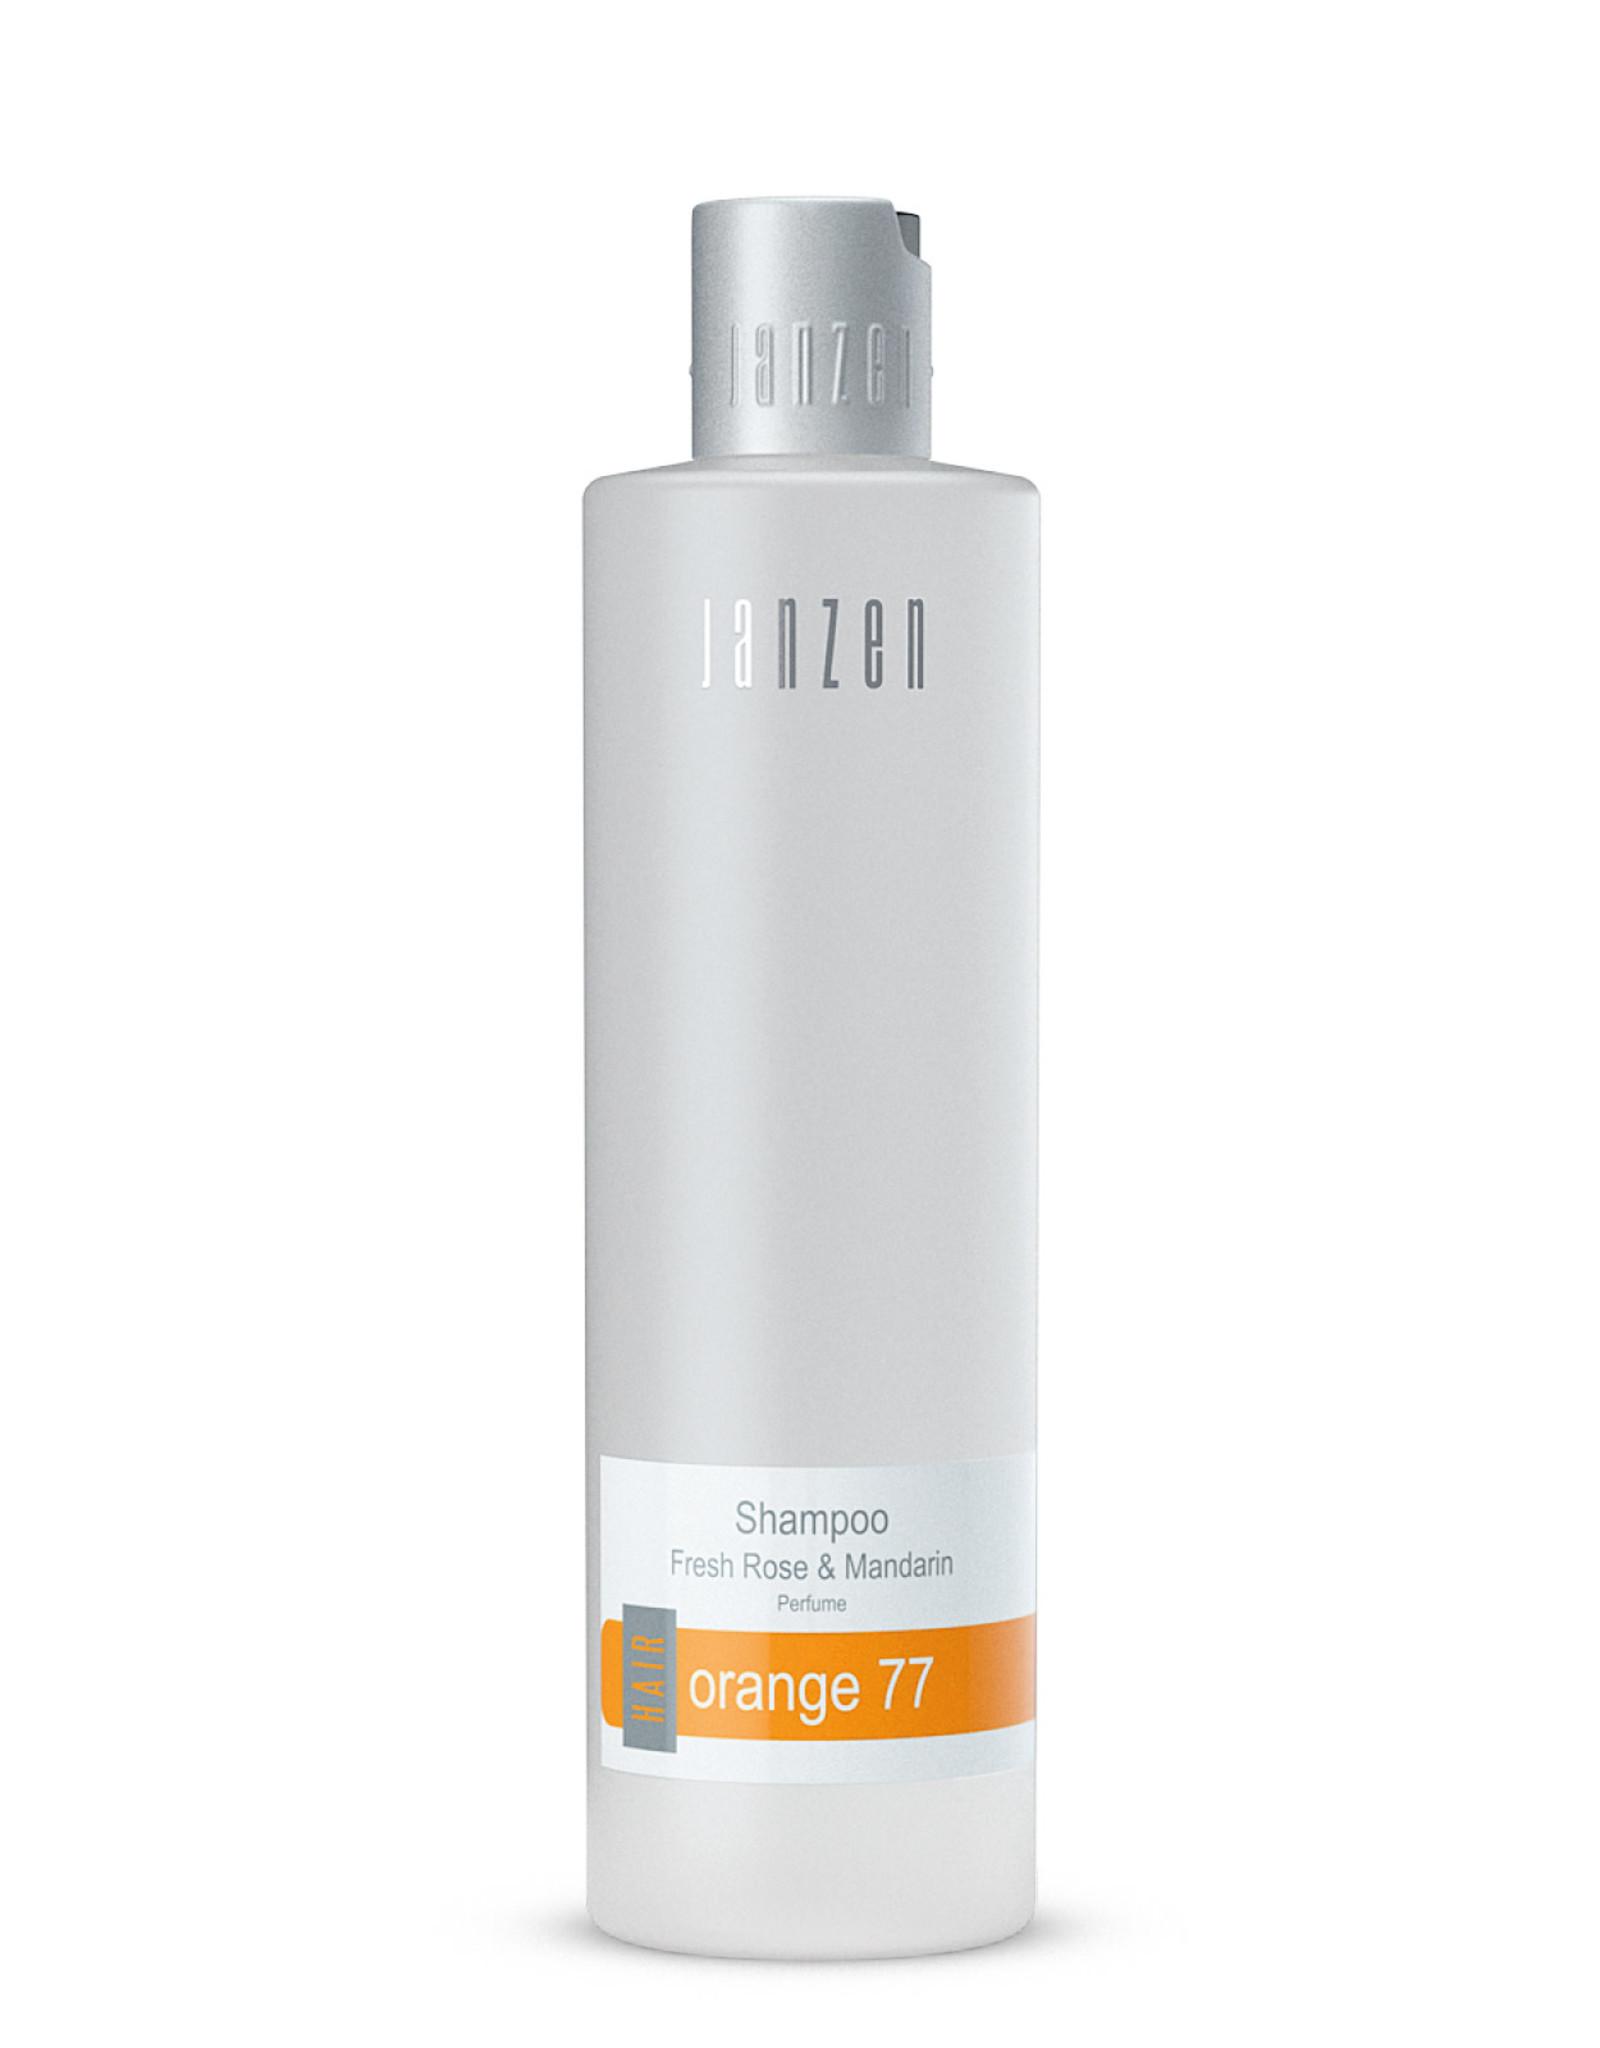 JANZEN Shampoo Orange 77 300ml - JANZEN